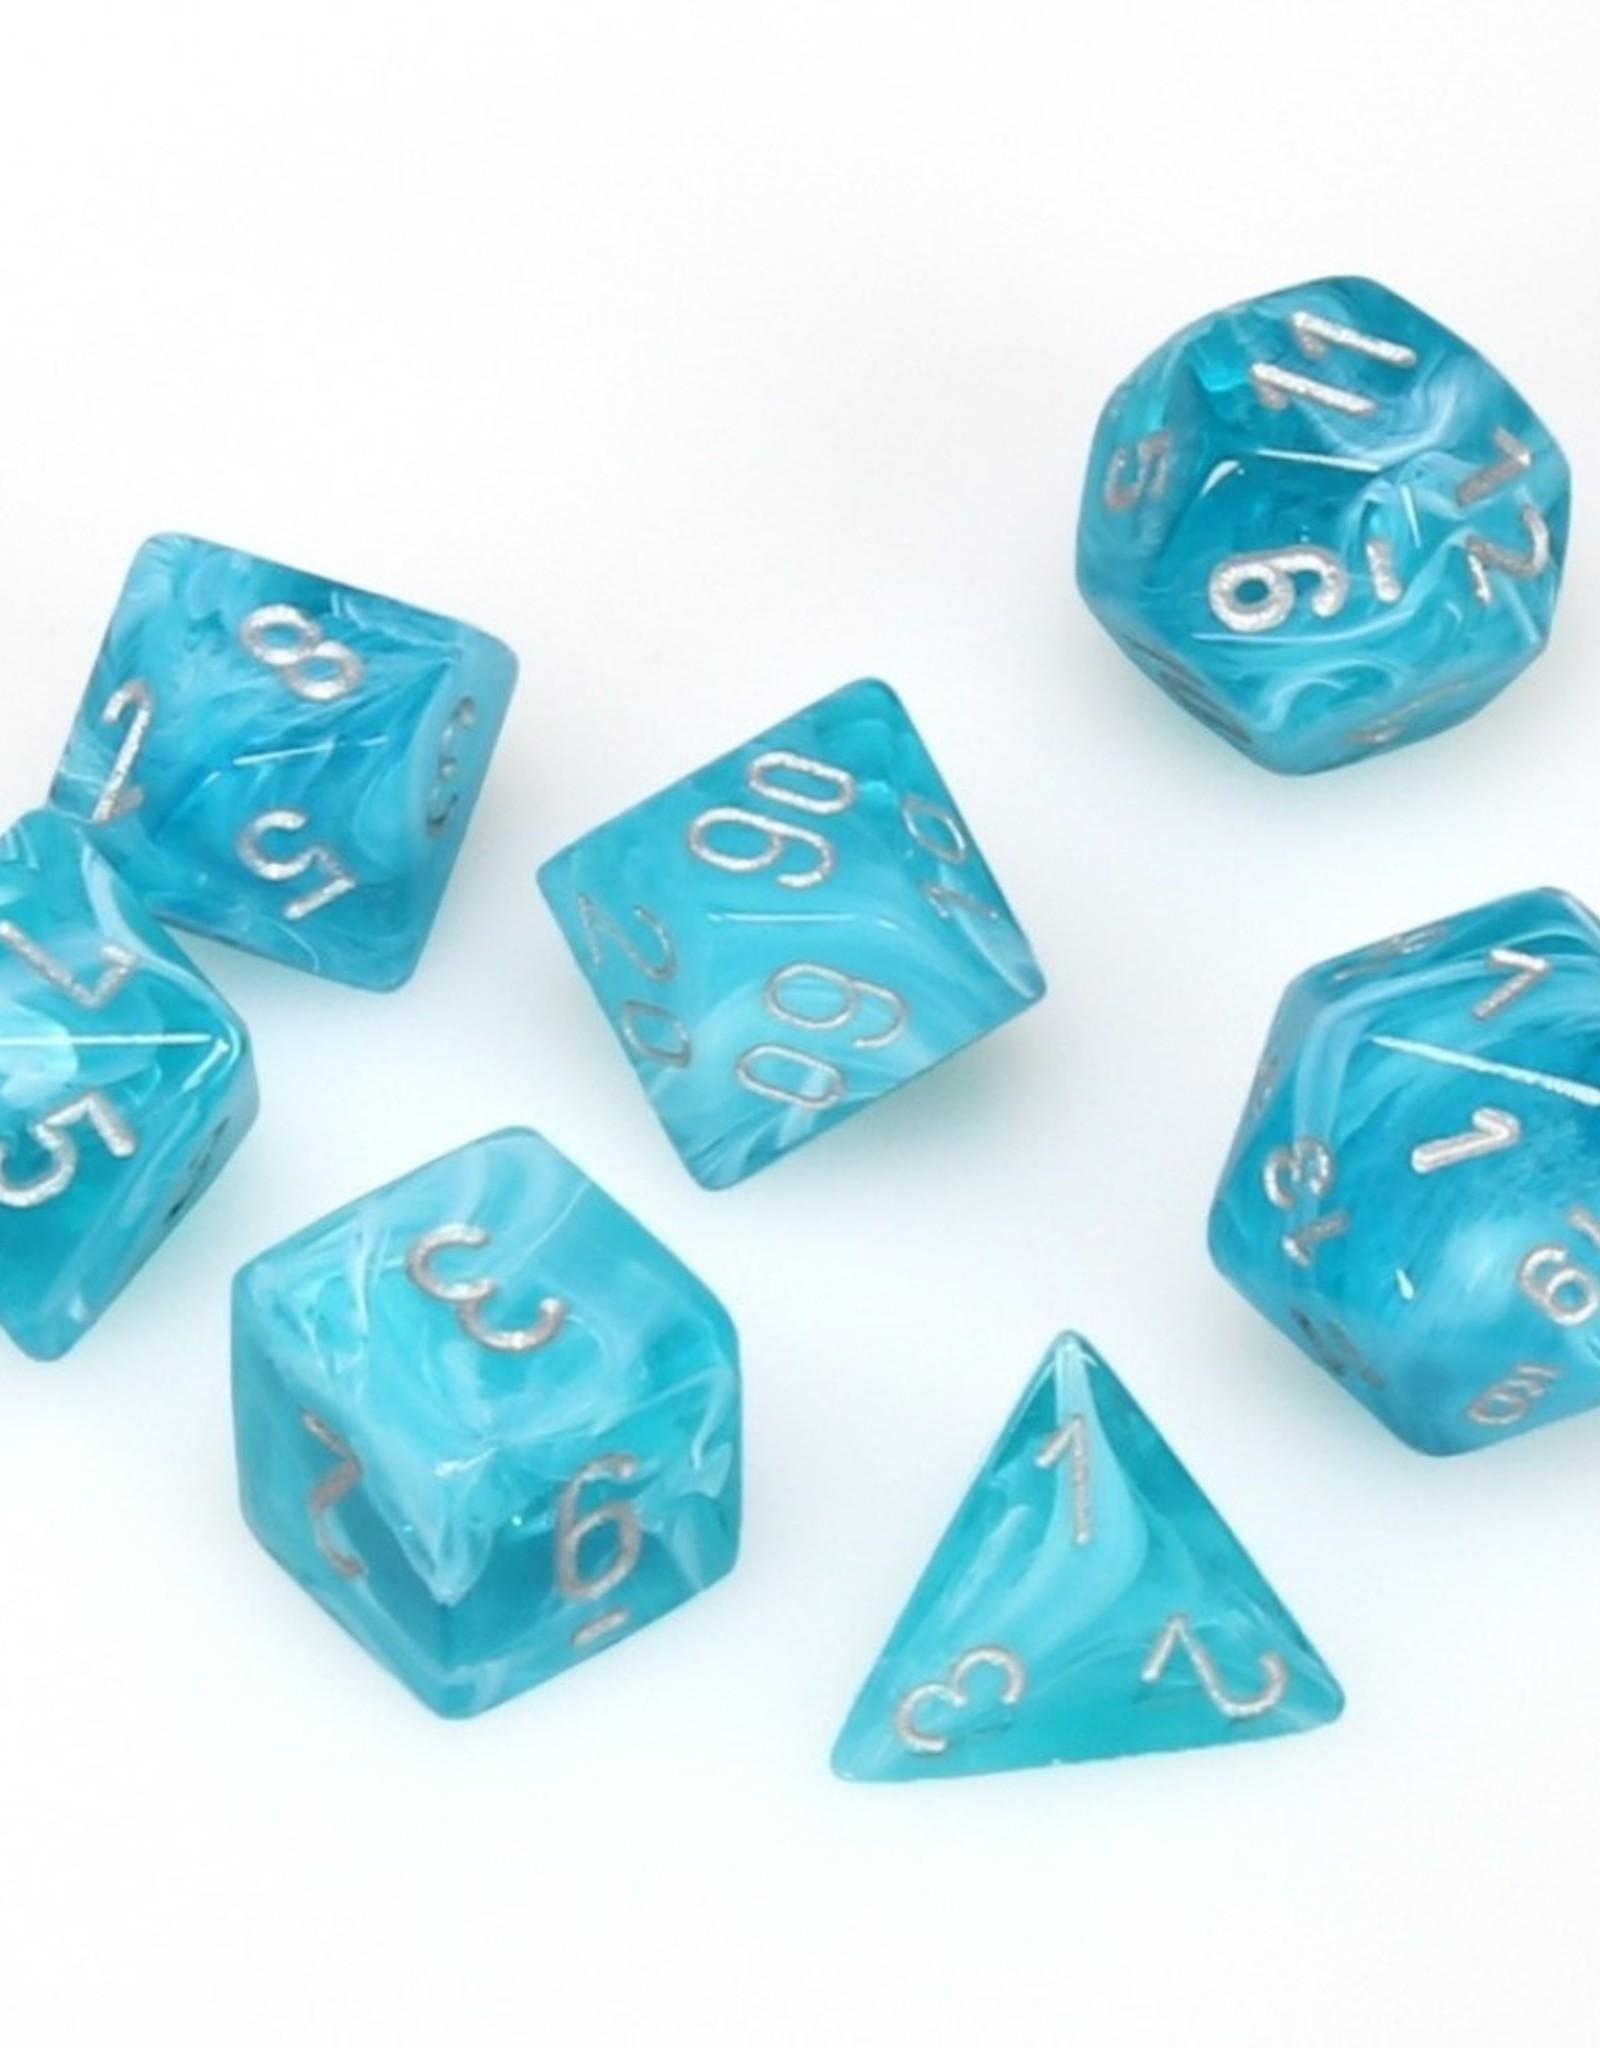 Chessex Chessex 7-Die set Cirrus - Aqua/Silver